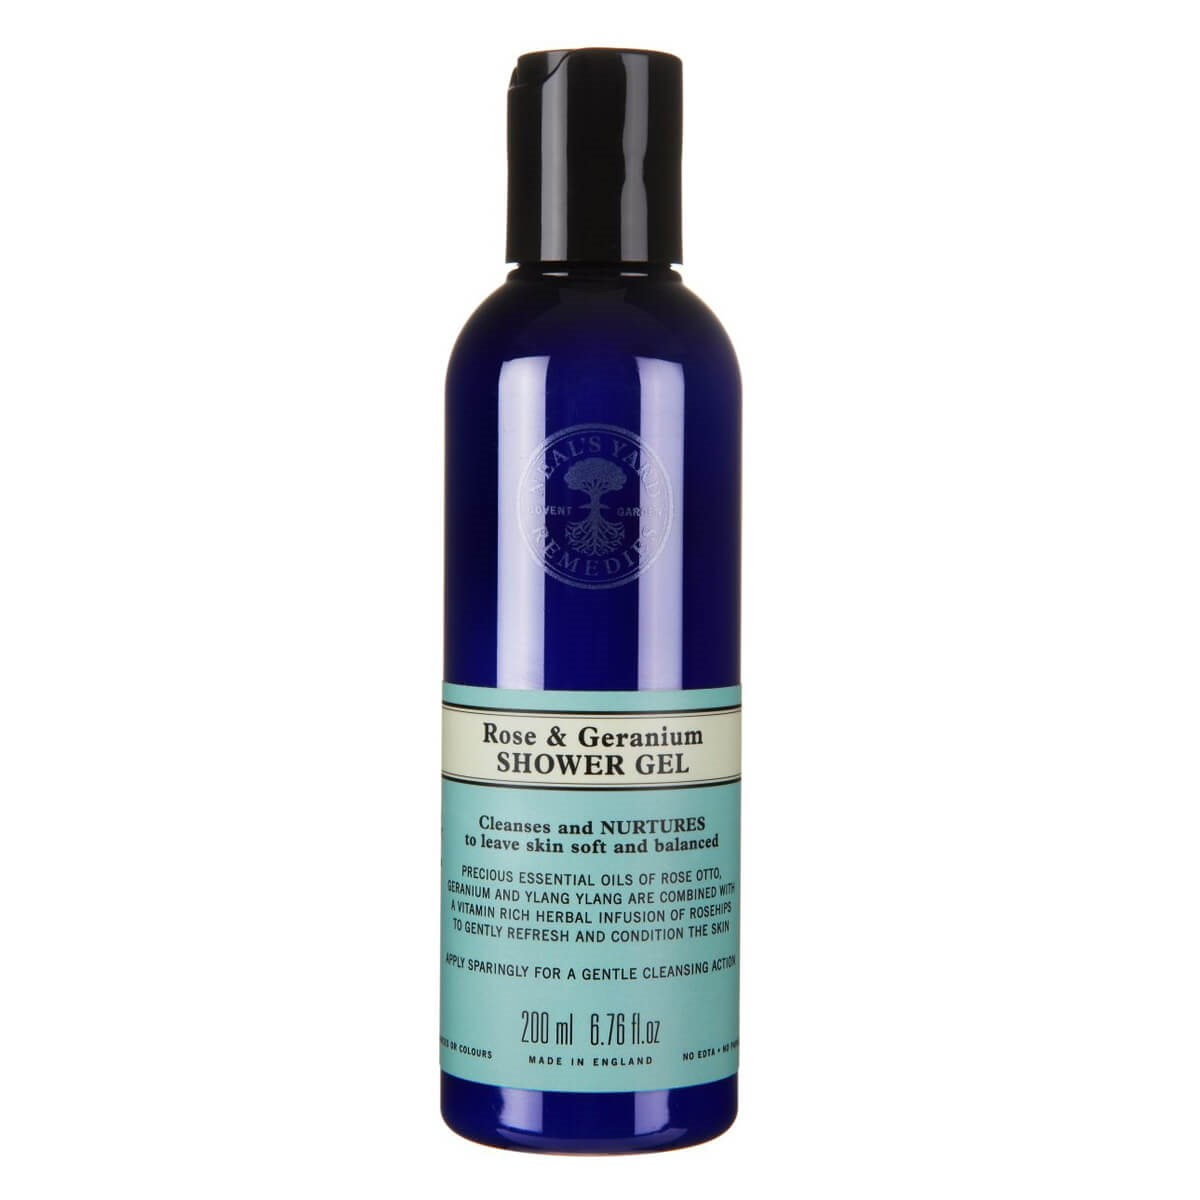 Neal's Yard Remedies Rose & Geranium Shower Gel